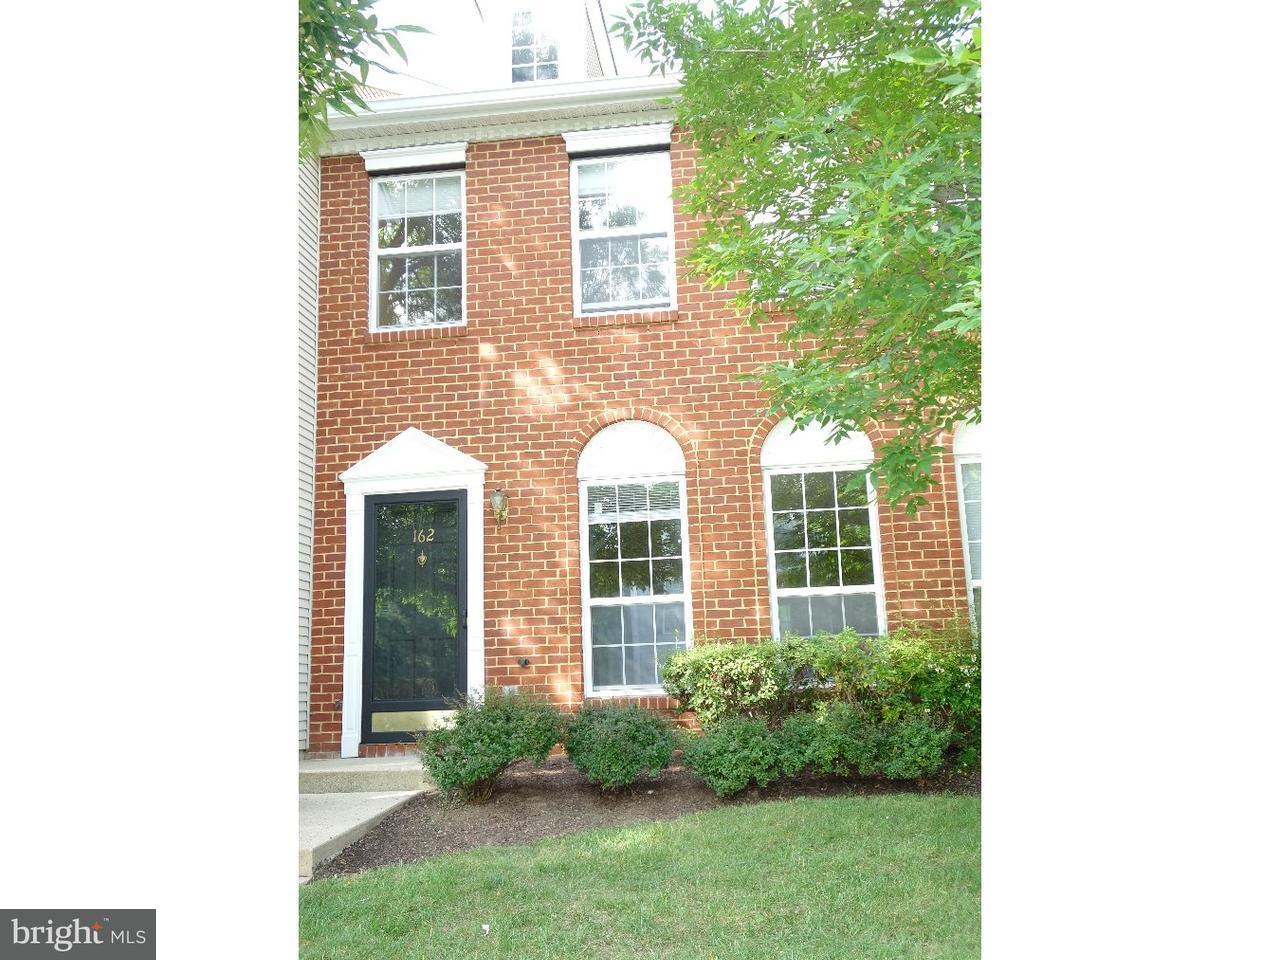 Condominium for Sale at 162 SHREWSBURY Court Pennington, New Jersey 08534 United StatesMunicipality: Hopewell Township